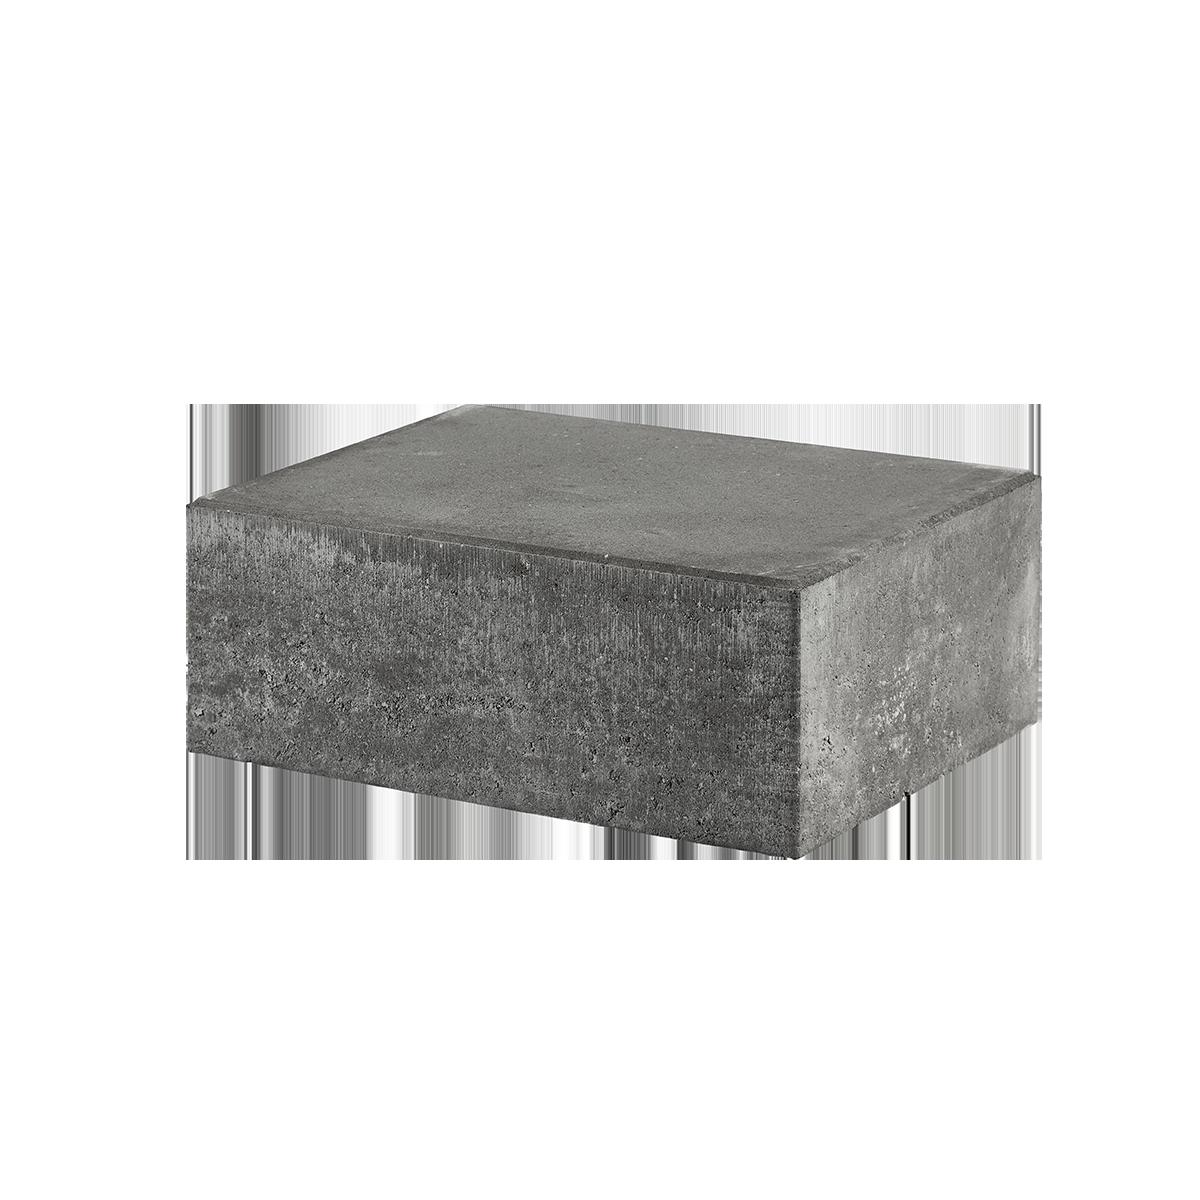 Trappetrin 30x40x15 cm Grå Lige kant